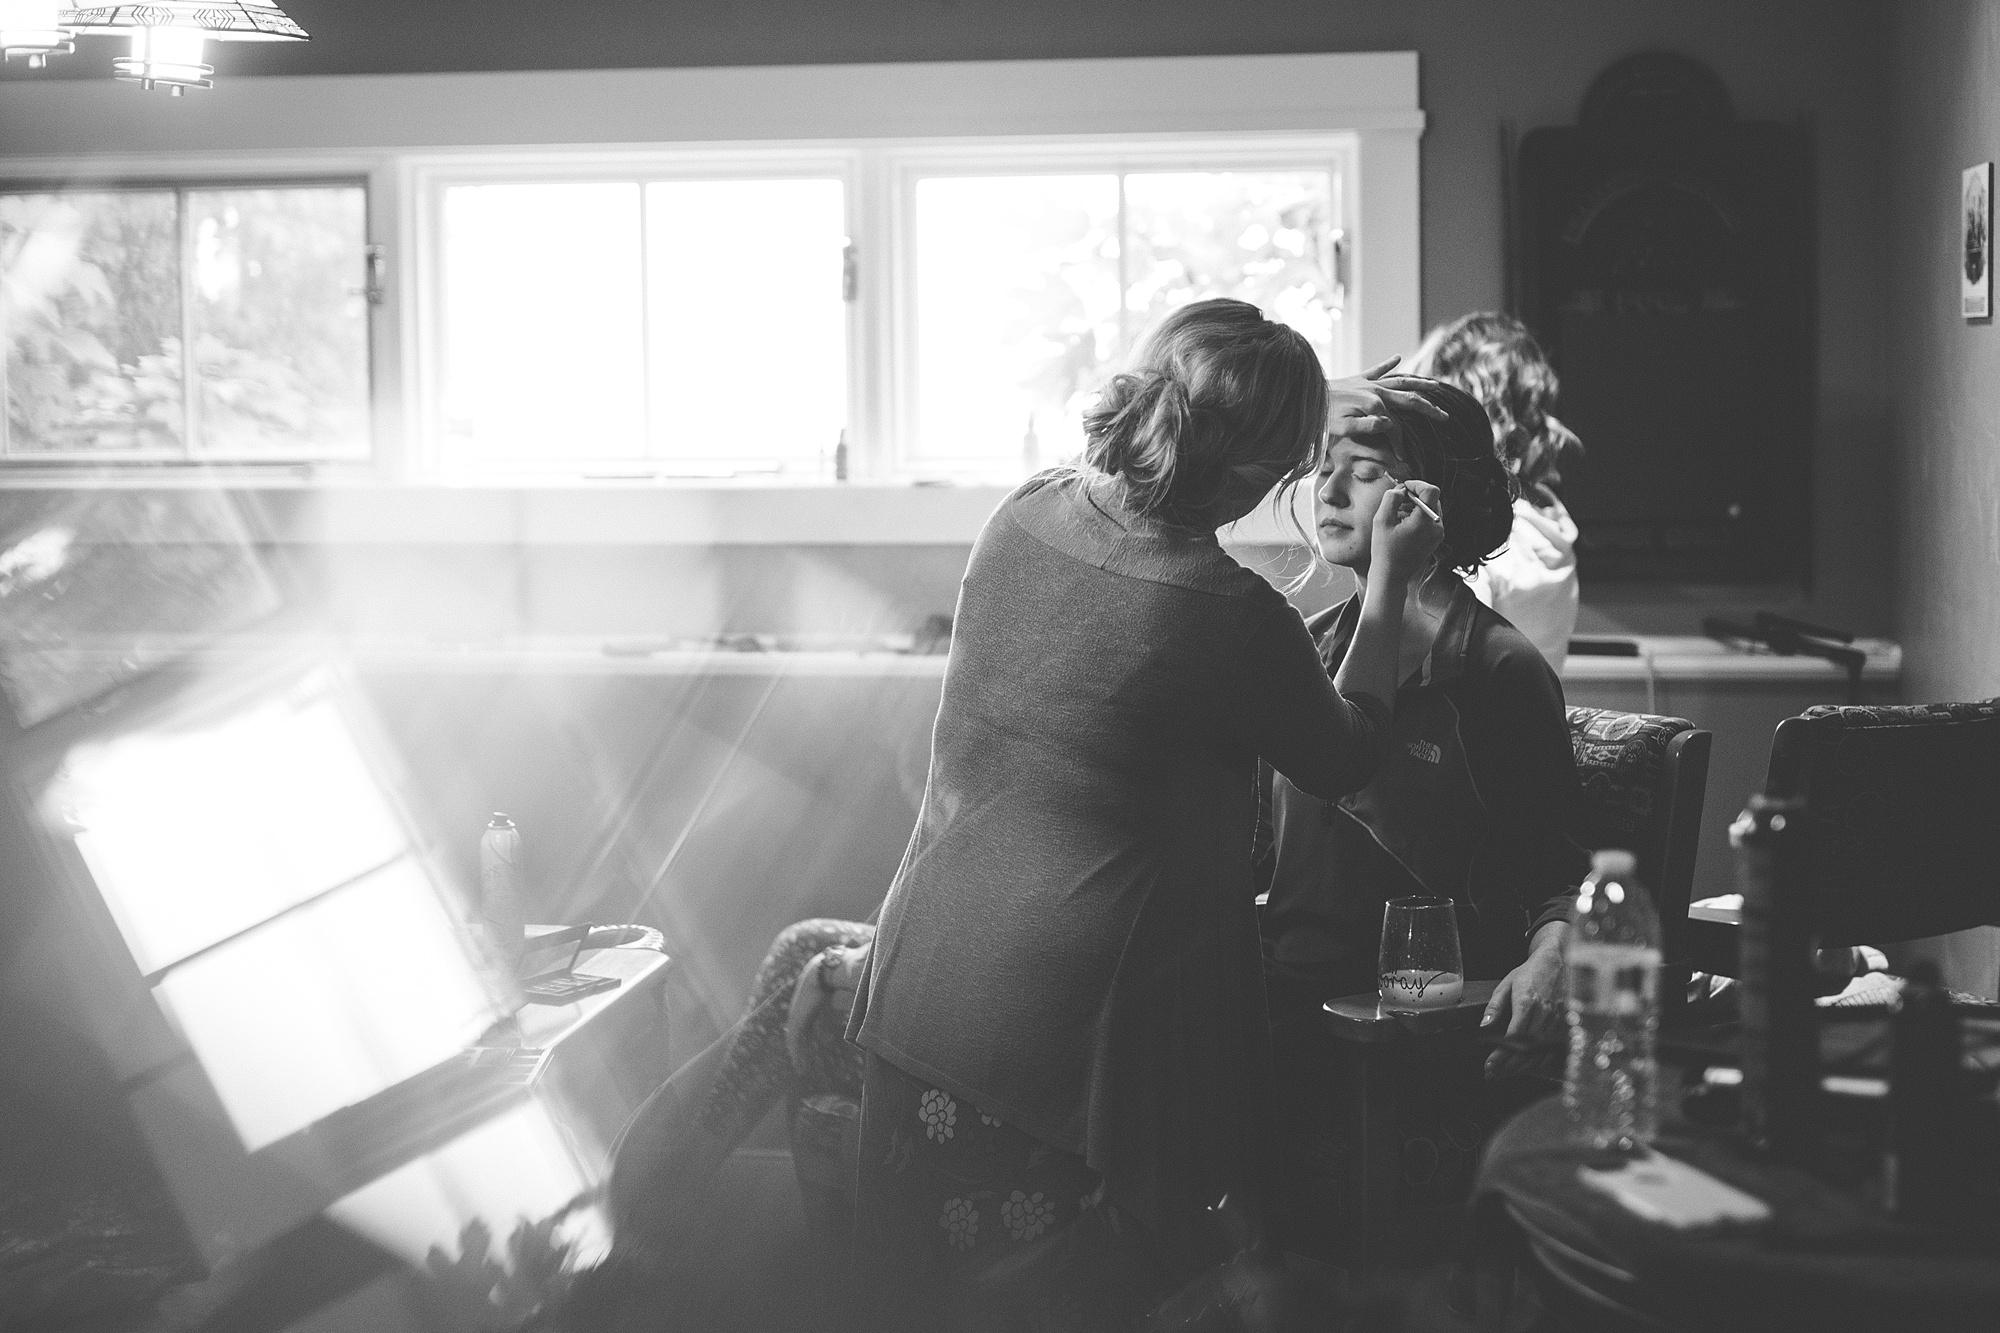 Brandon_Shafer_Photography_Emily_Travis_Kalamazoo_Wedding_Photography_0006.jpg